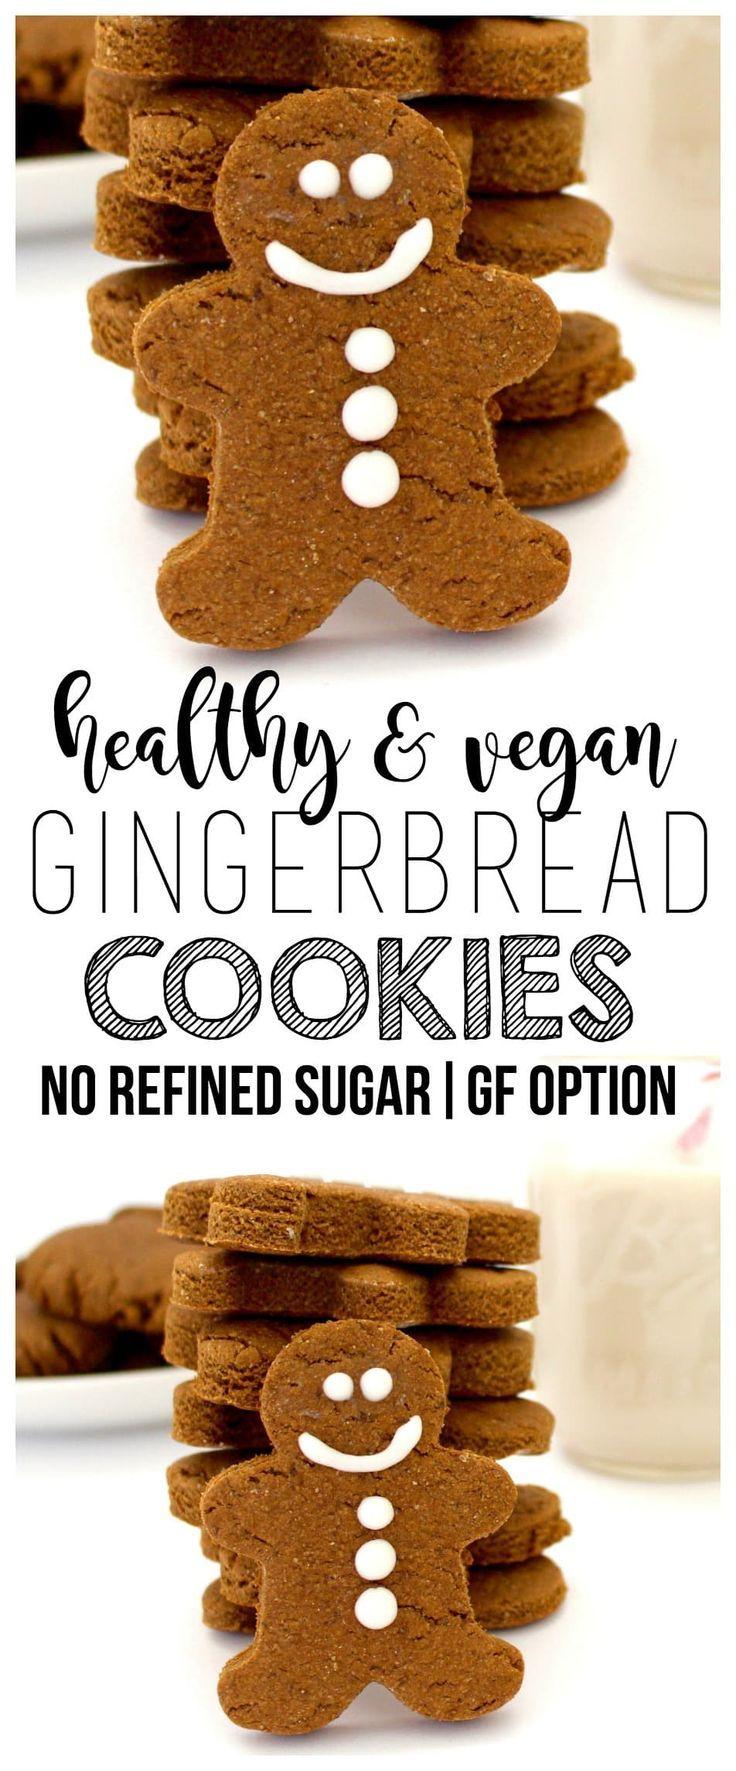 Vegan Gingerbread Cookies #holidaytreats